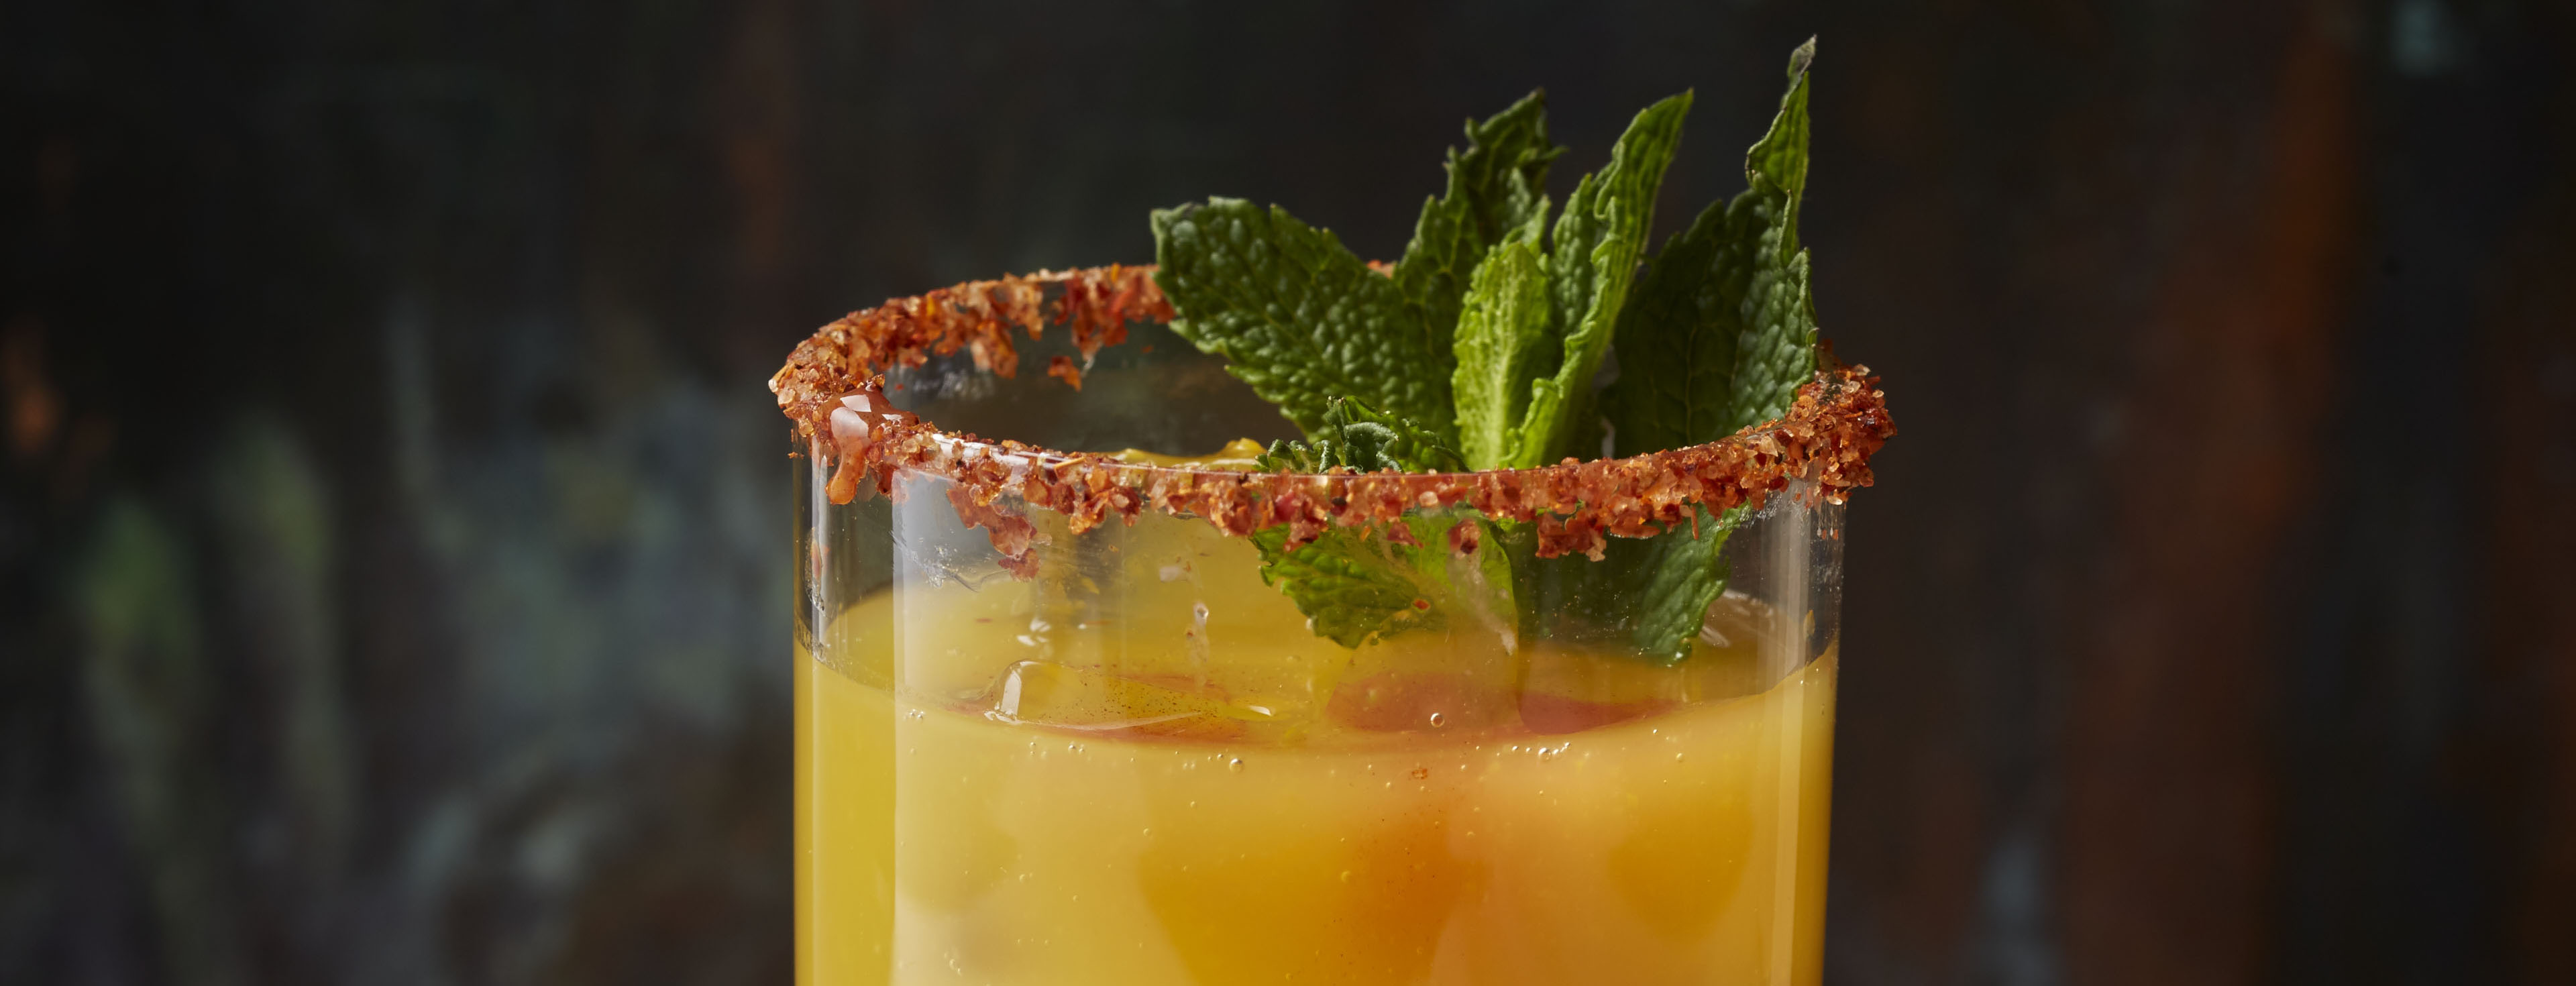 Photo of Mango Chili Limeade